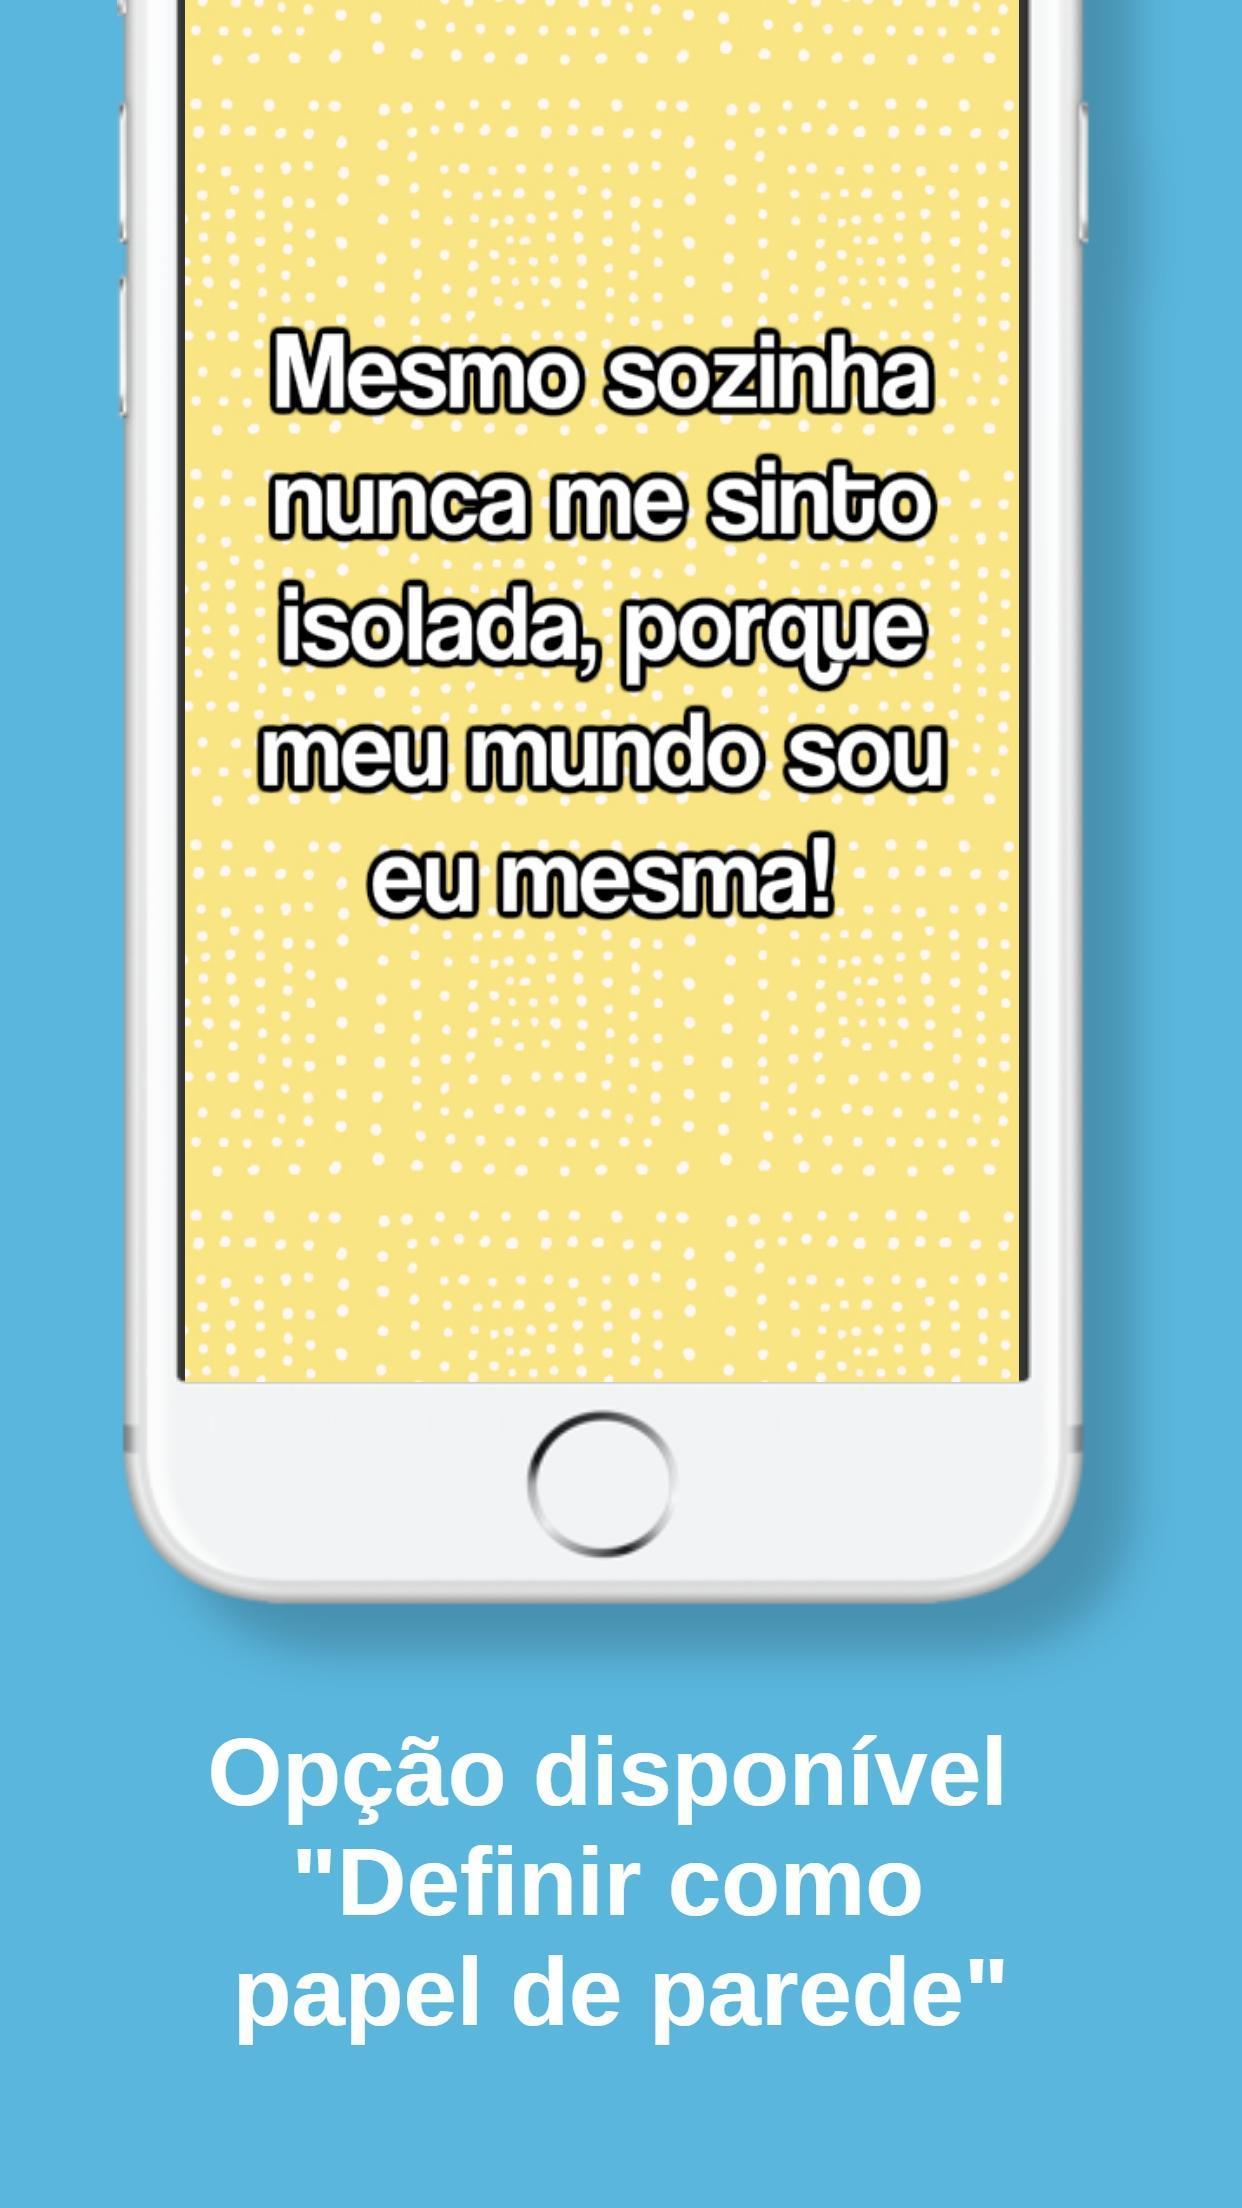 Frases De Solidão For Android Apk Download